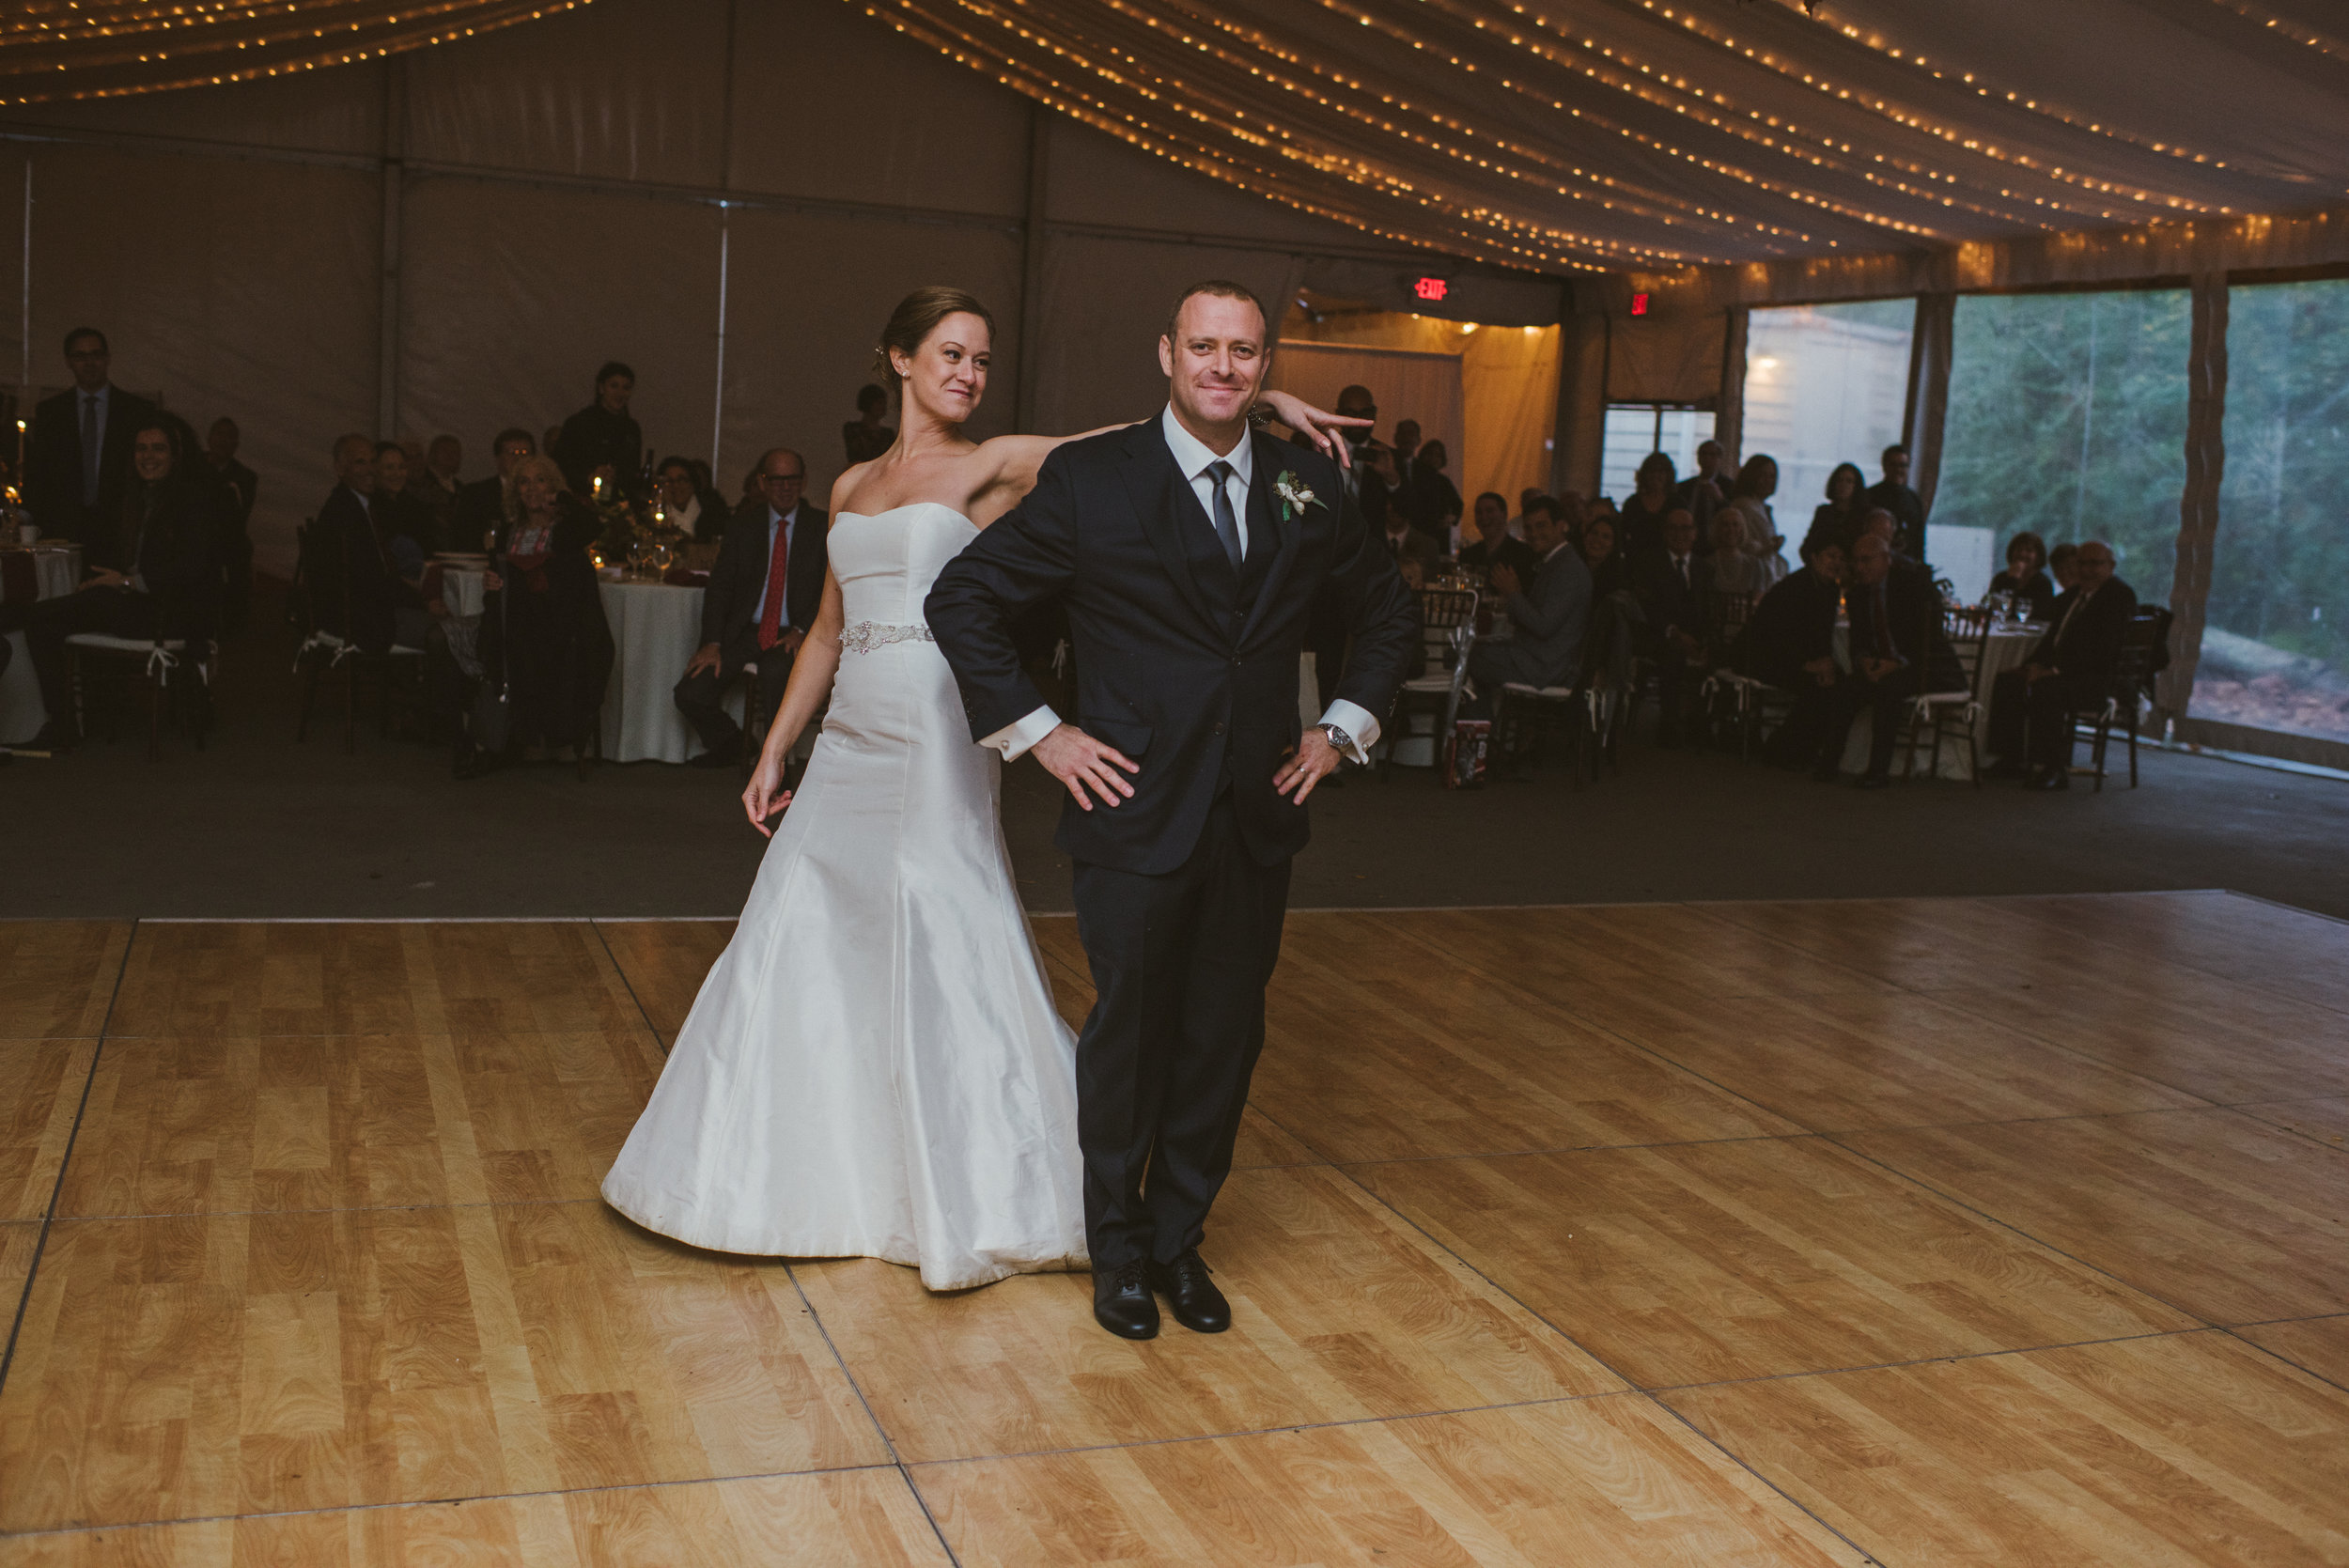 JACQUELINE & ANDREW WARSHAWER -BROOKMILL FARM FALL WEDDING - INTIMATE WEDDING PHOTOGRAPHER - TWOTWENTY by CHI-CHI AGBIM-466.jpg